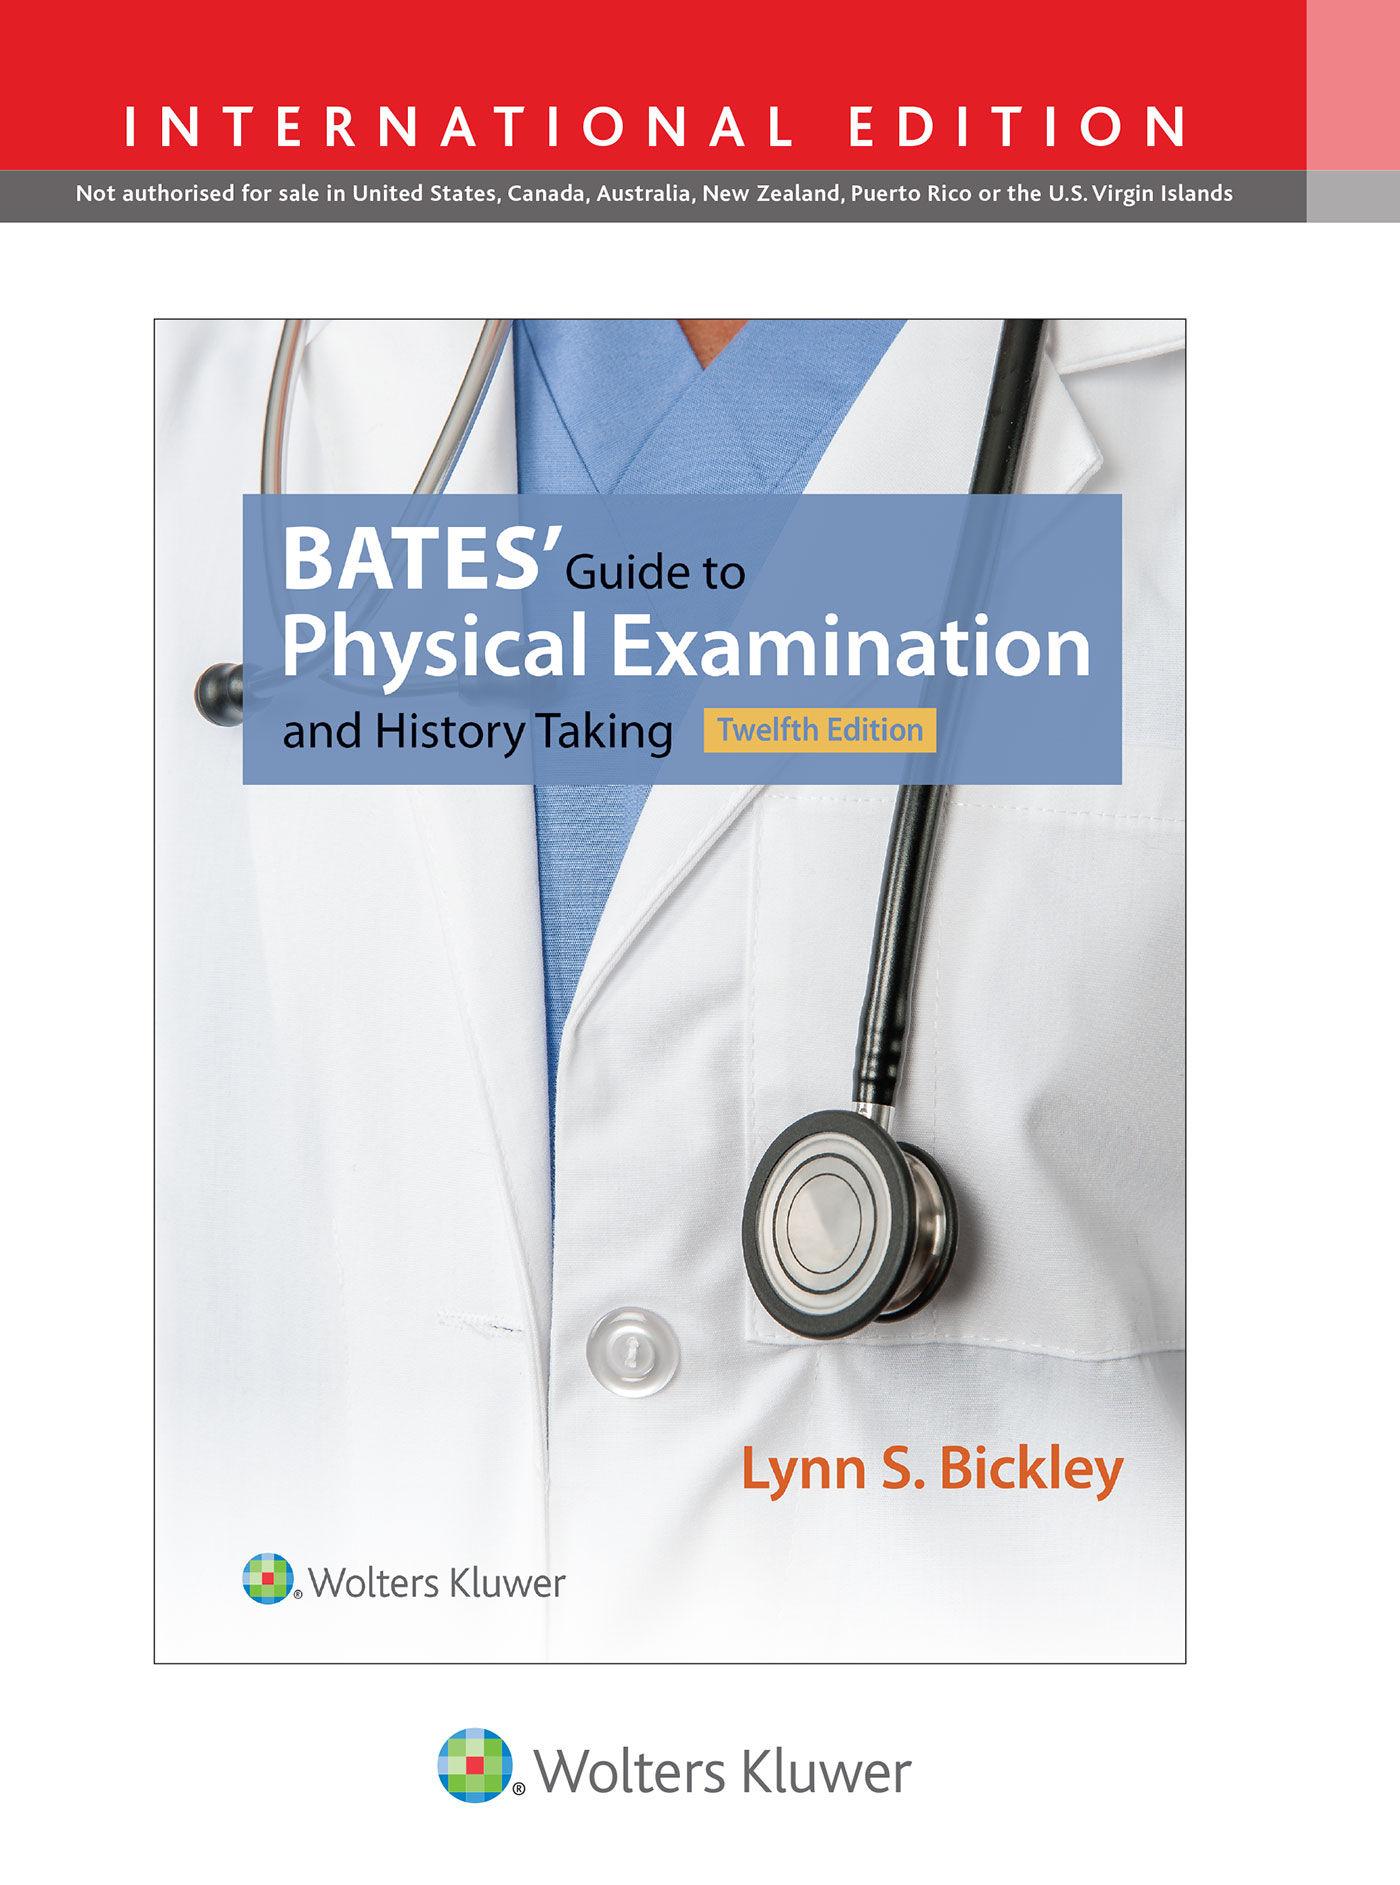 barbara bates guide to physical examination latest edition